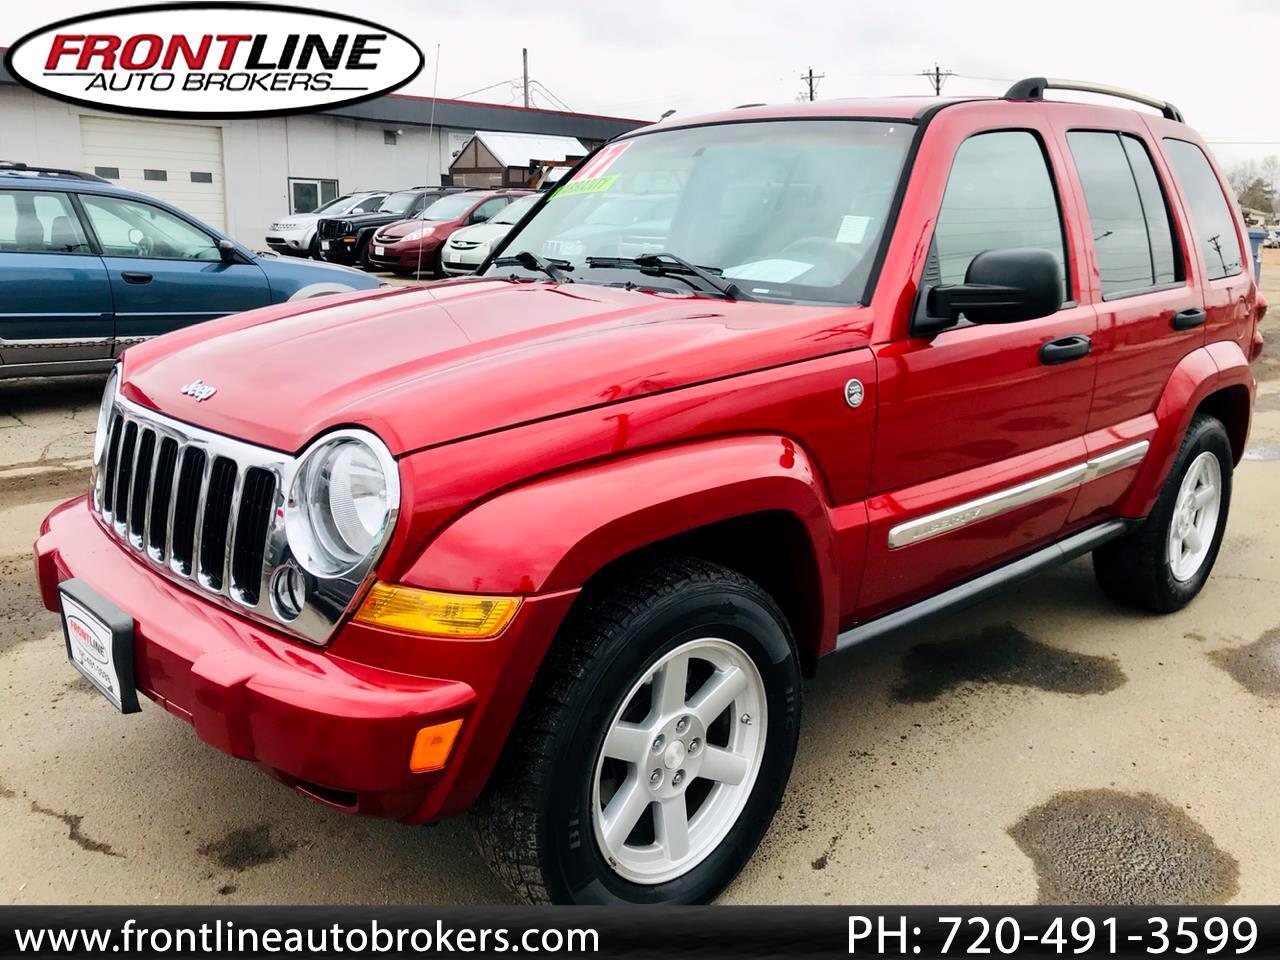 2007 Jeep Liberty Limited